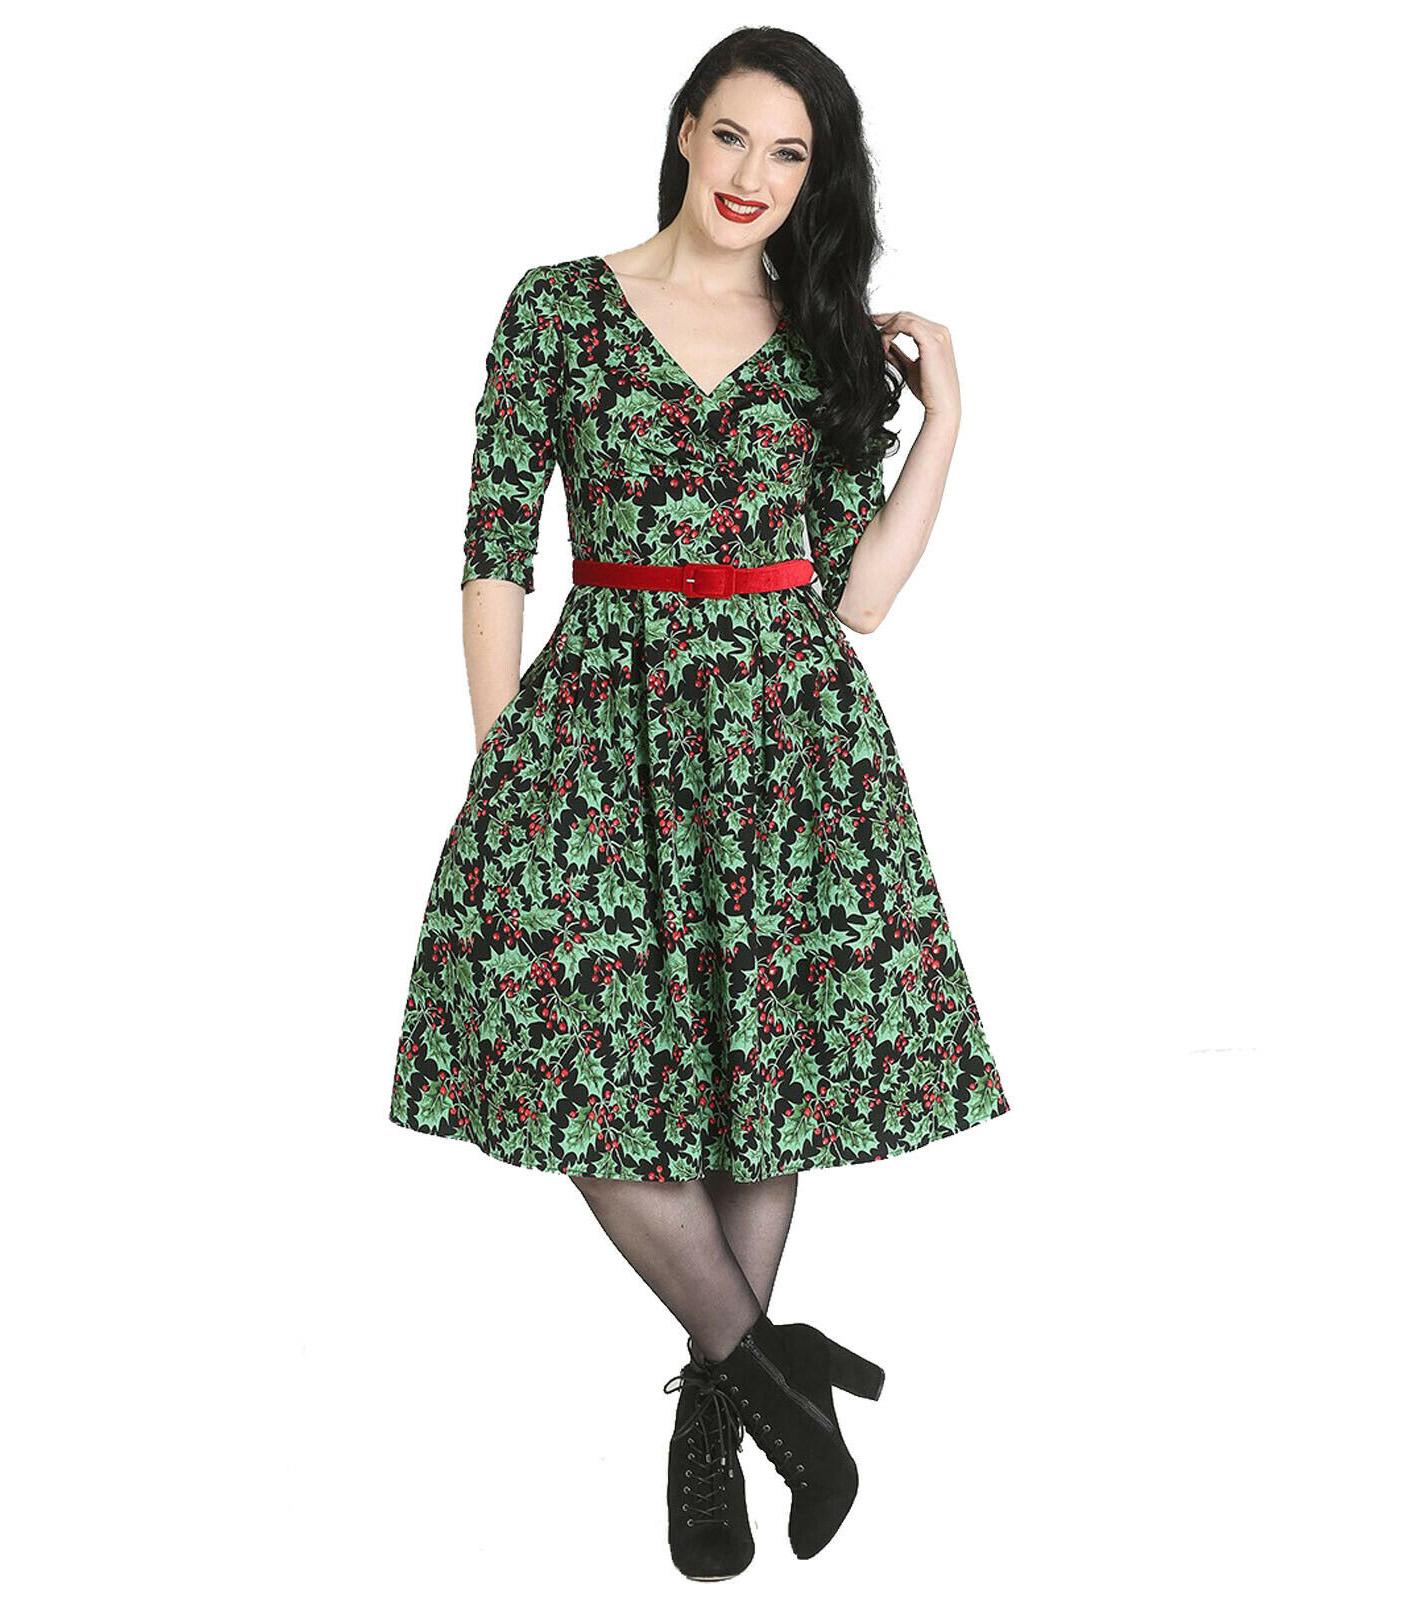 Hell-Bunny-50s-Pin-Up-Navidad-Vestido-Festivo-Rojo-Holly-Berry-Negro-Todos-los-Tamanos miniatura 15